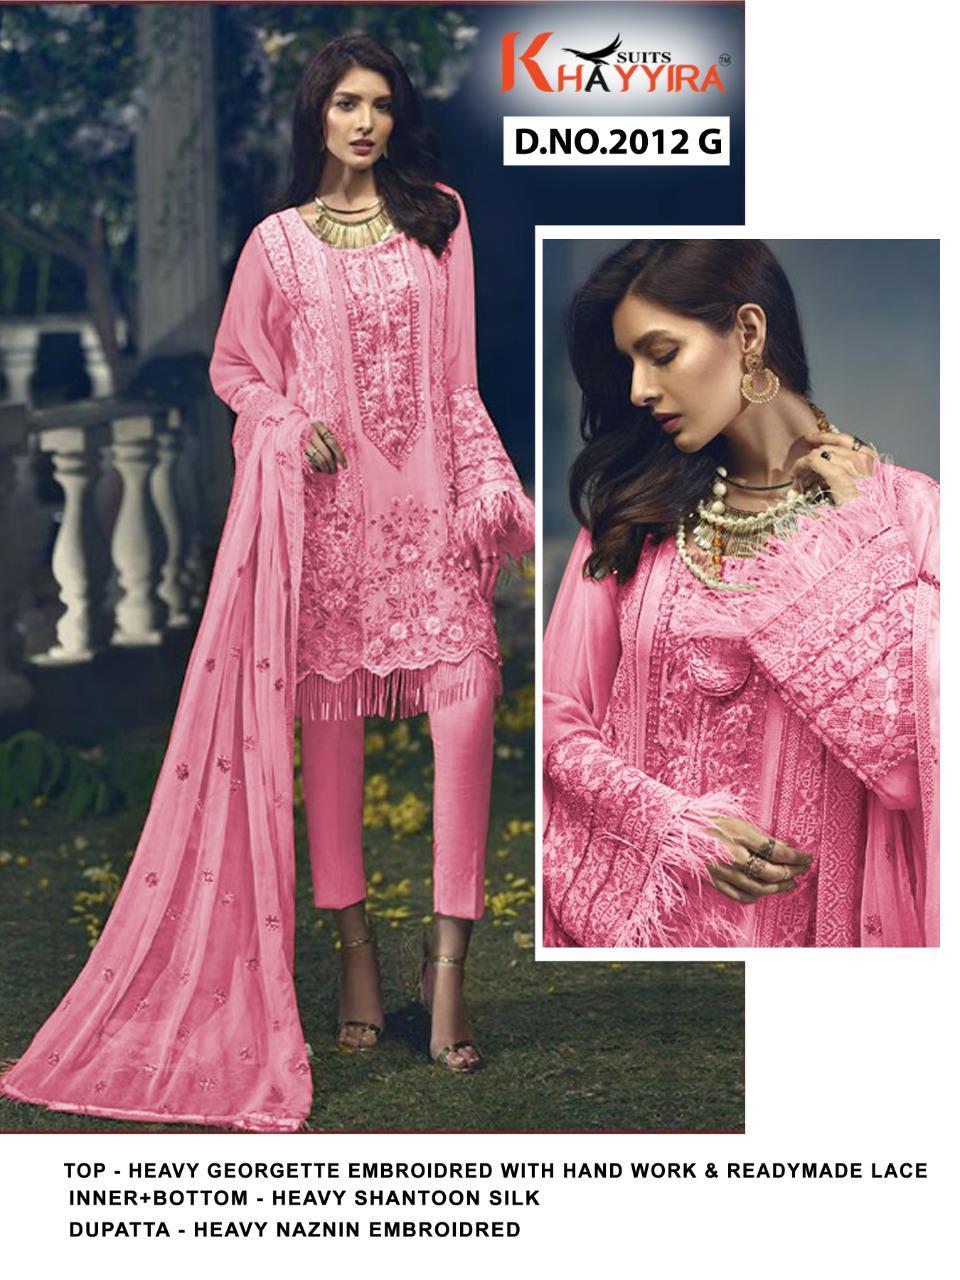 Khayyira Cross Stitch Salwar Suit Wholesale Catalog 8 Pcs 6 - Khayyira Cross Stitch Salwar Suit Wholesale Catalog 8 Pcs